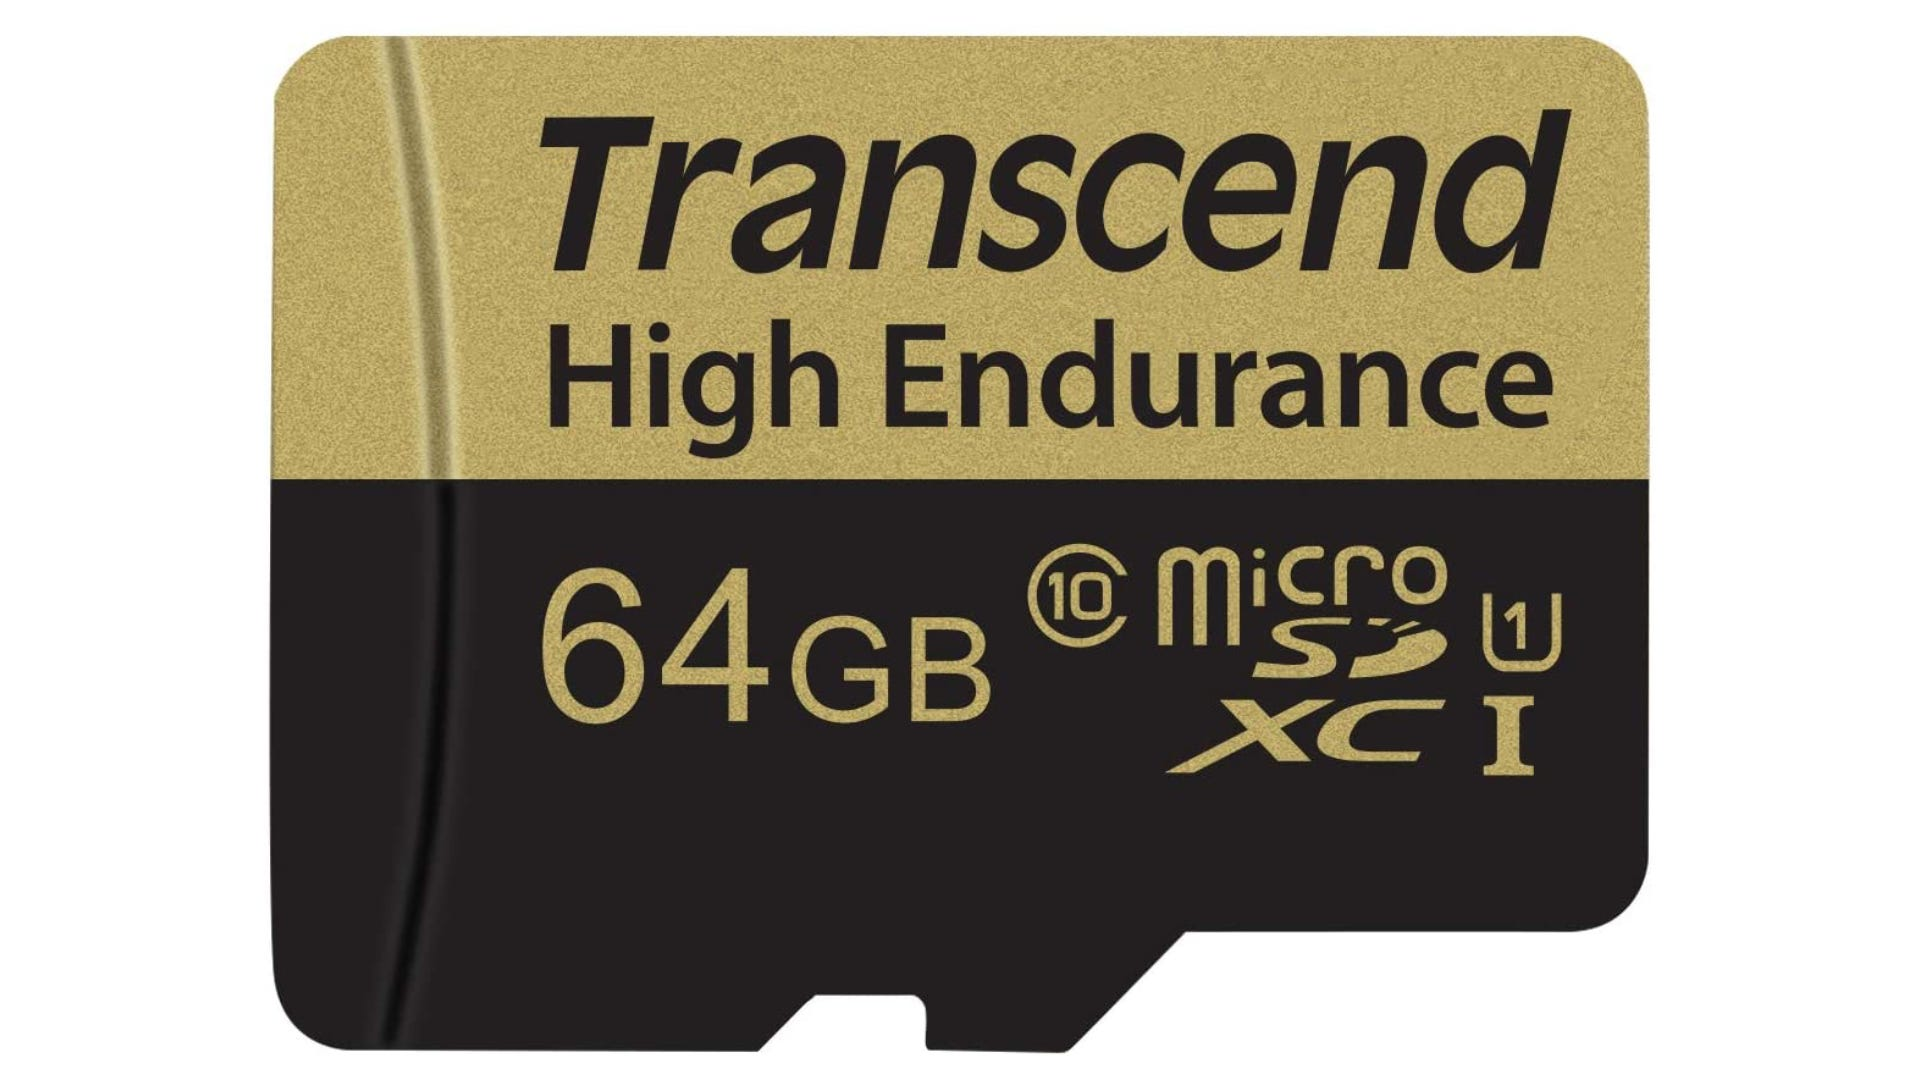 Transcend High Endurance microSD card